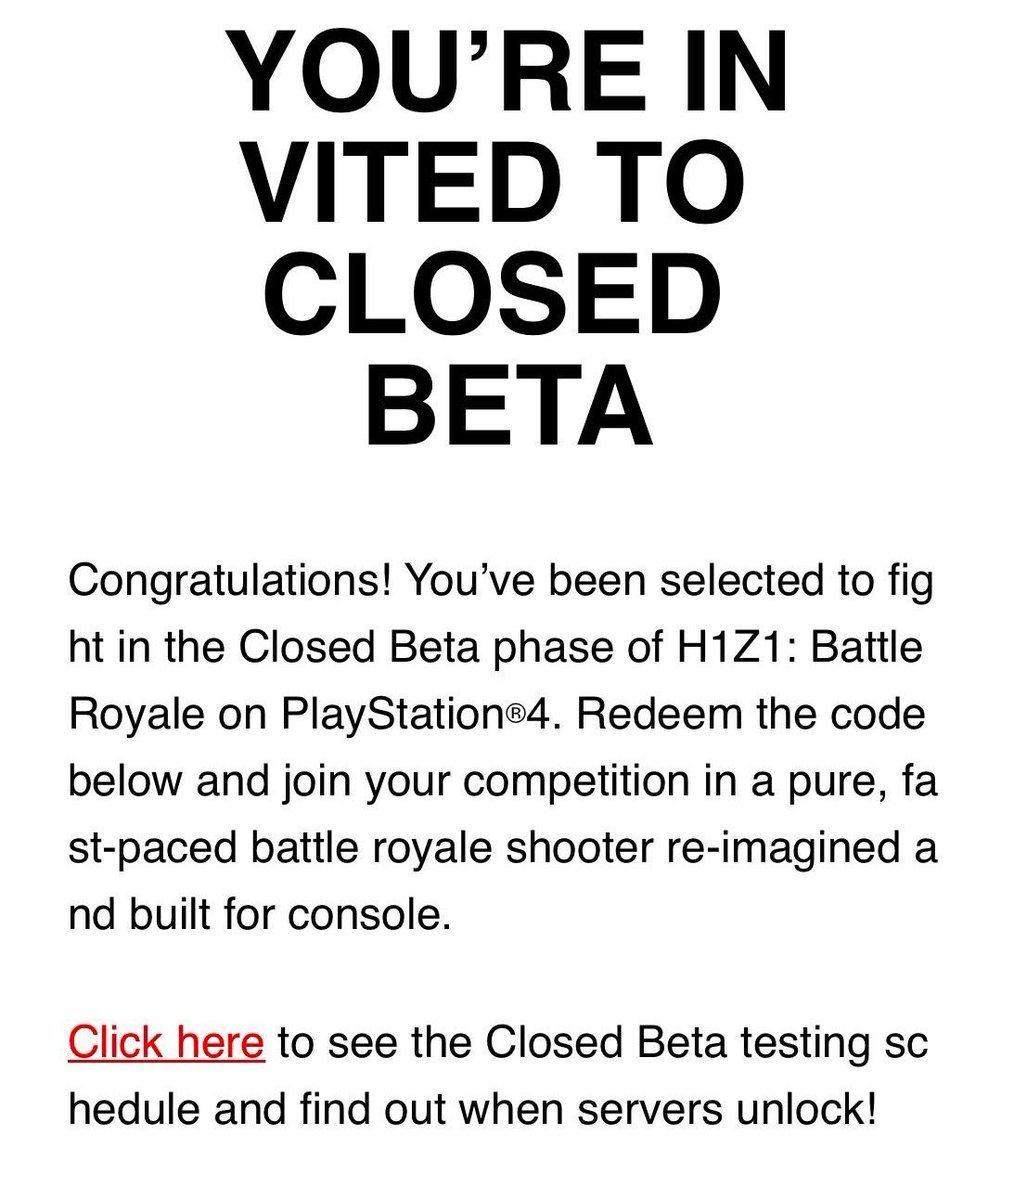 h1z1 closed beta